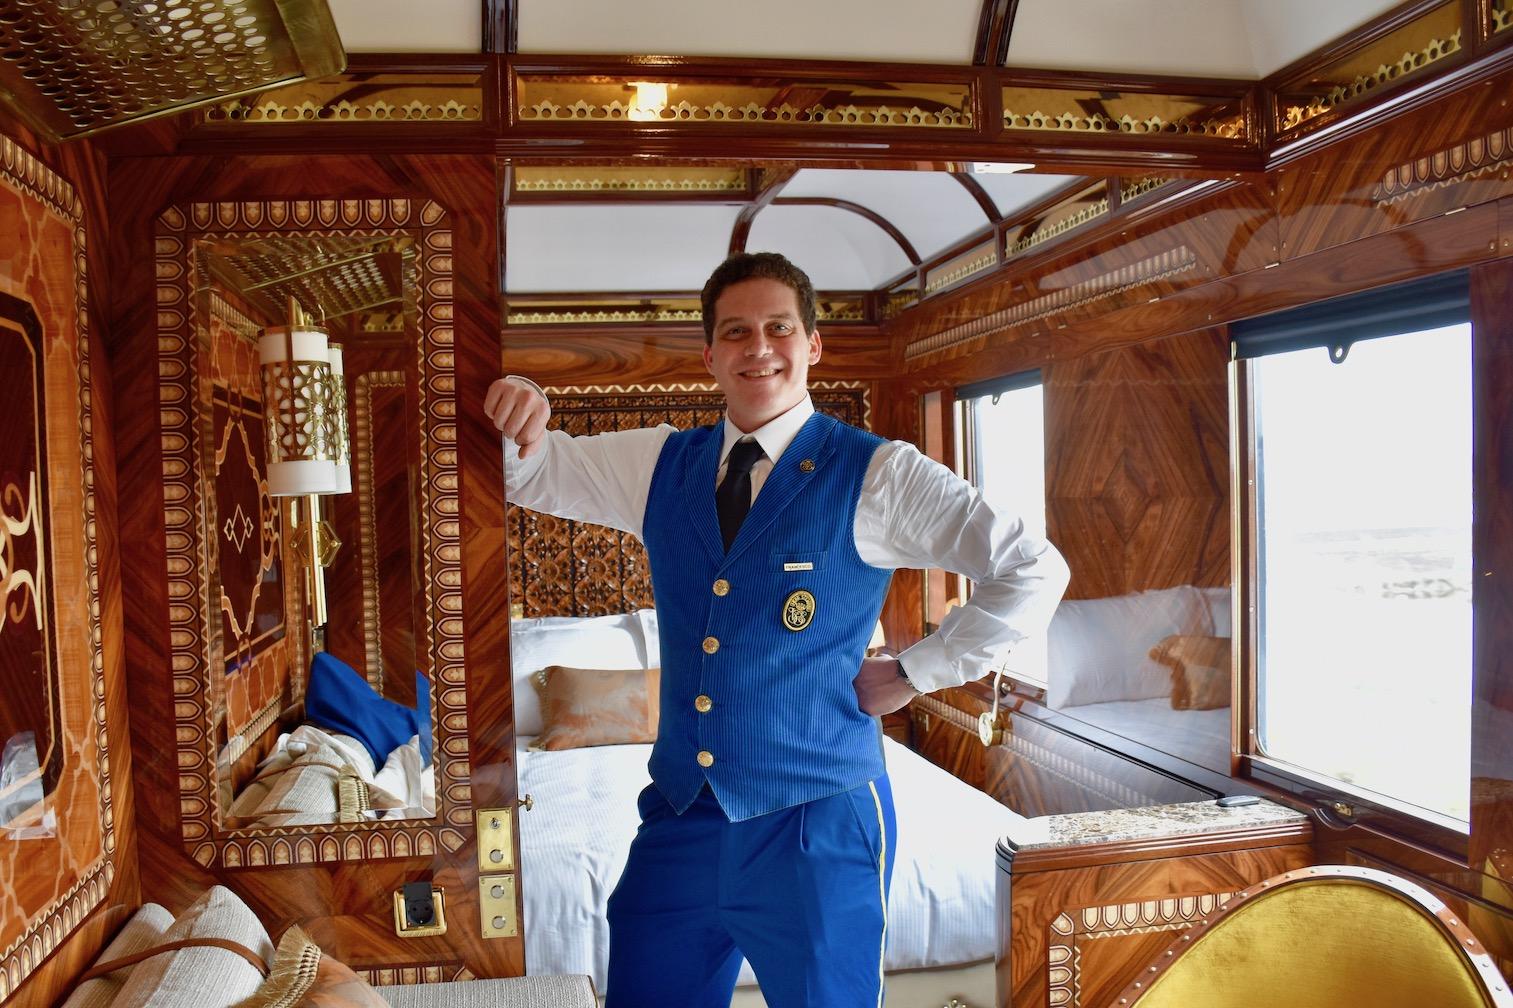 Venice Simplon-Orient-Express VSOE grand suite Istanbul steward.